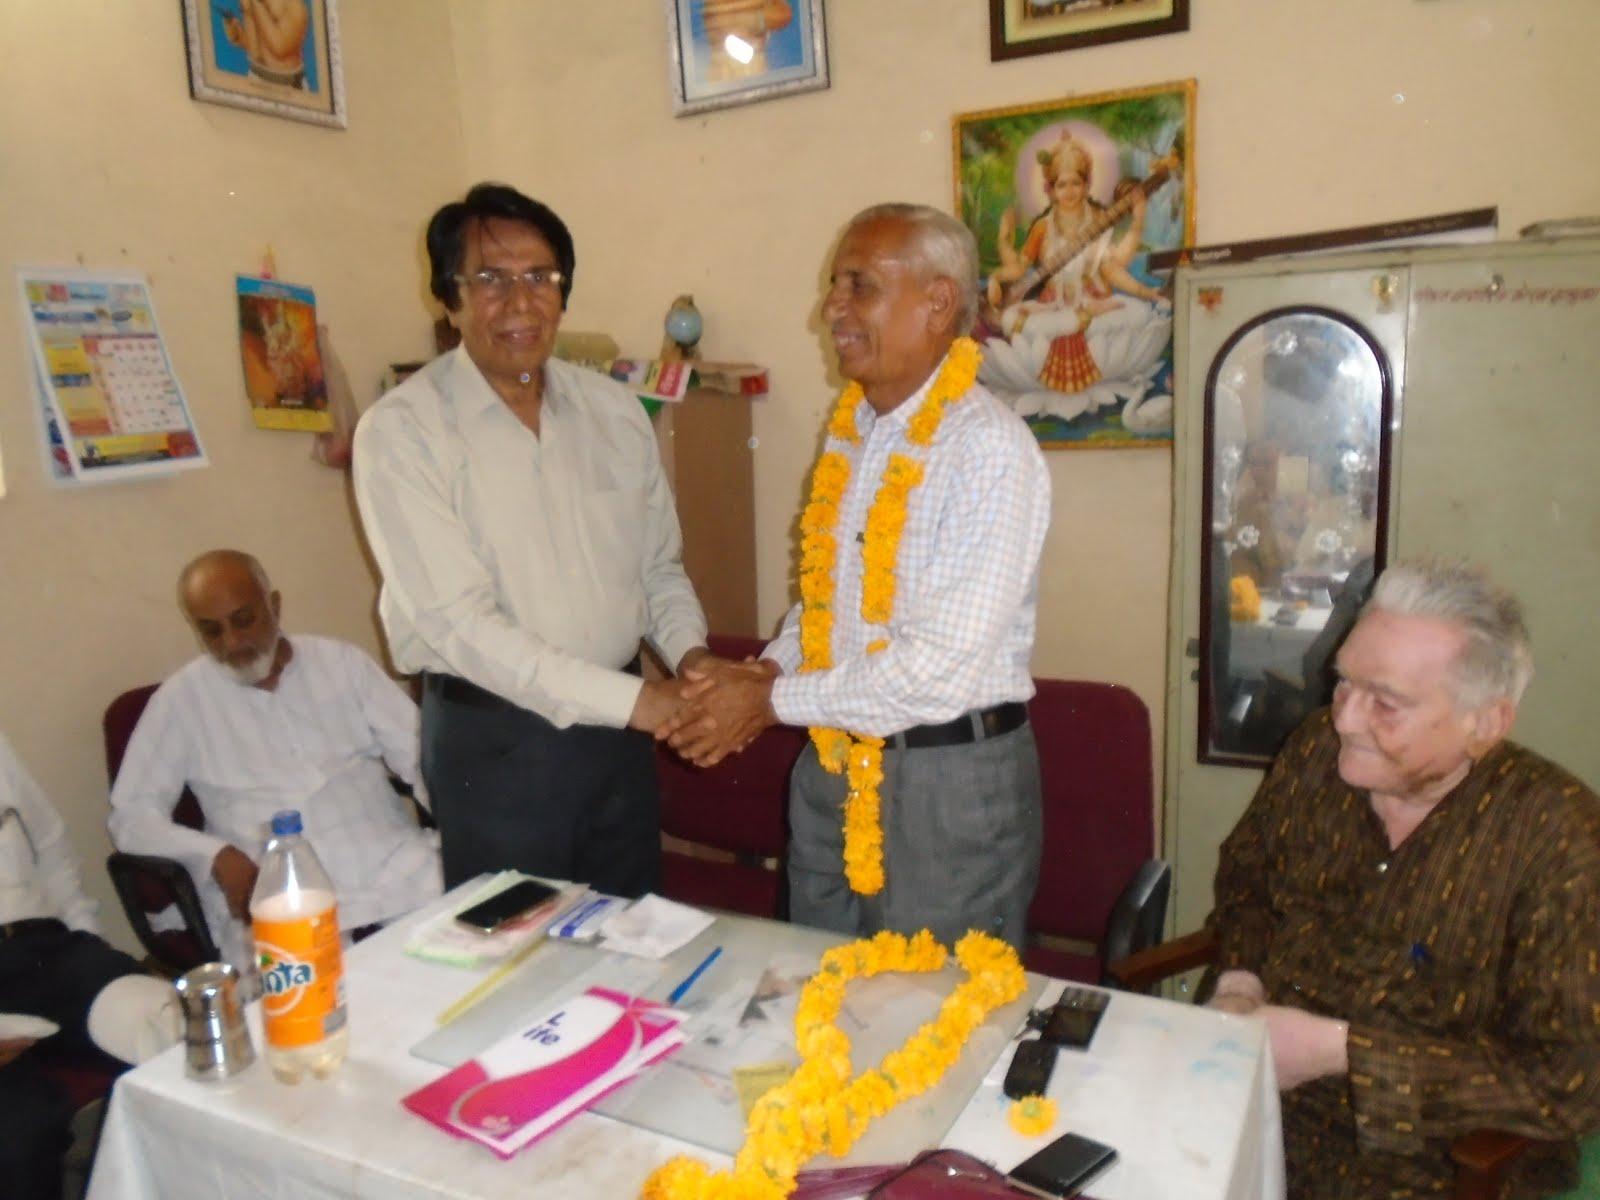 Ratan-Singh-Rathore-again-became-President-of-District-Pensioner-Association-रतनसिंह राठौर पुनः जिला पेंशनर संघ के अध्यक्ष बने